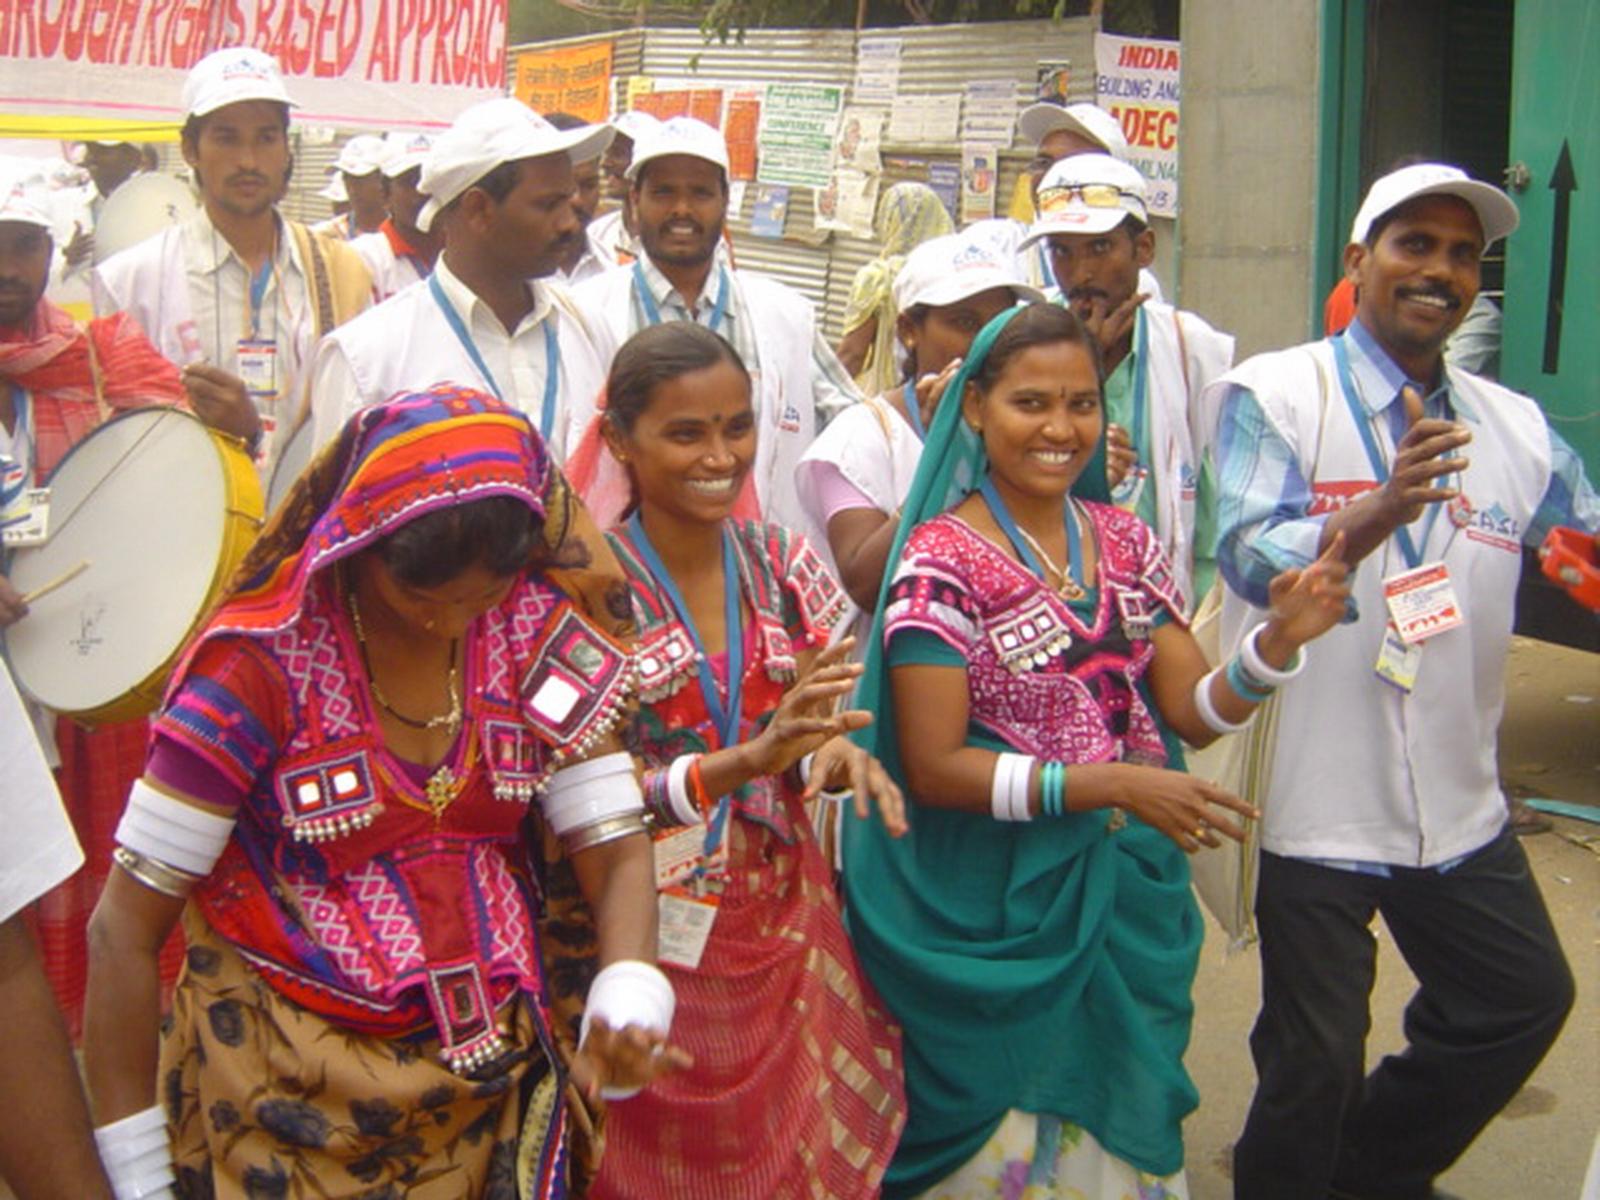 Indian festival photo